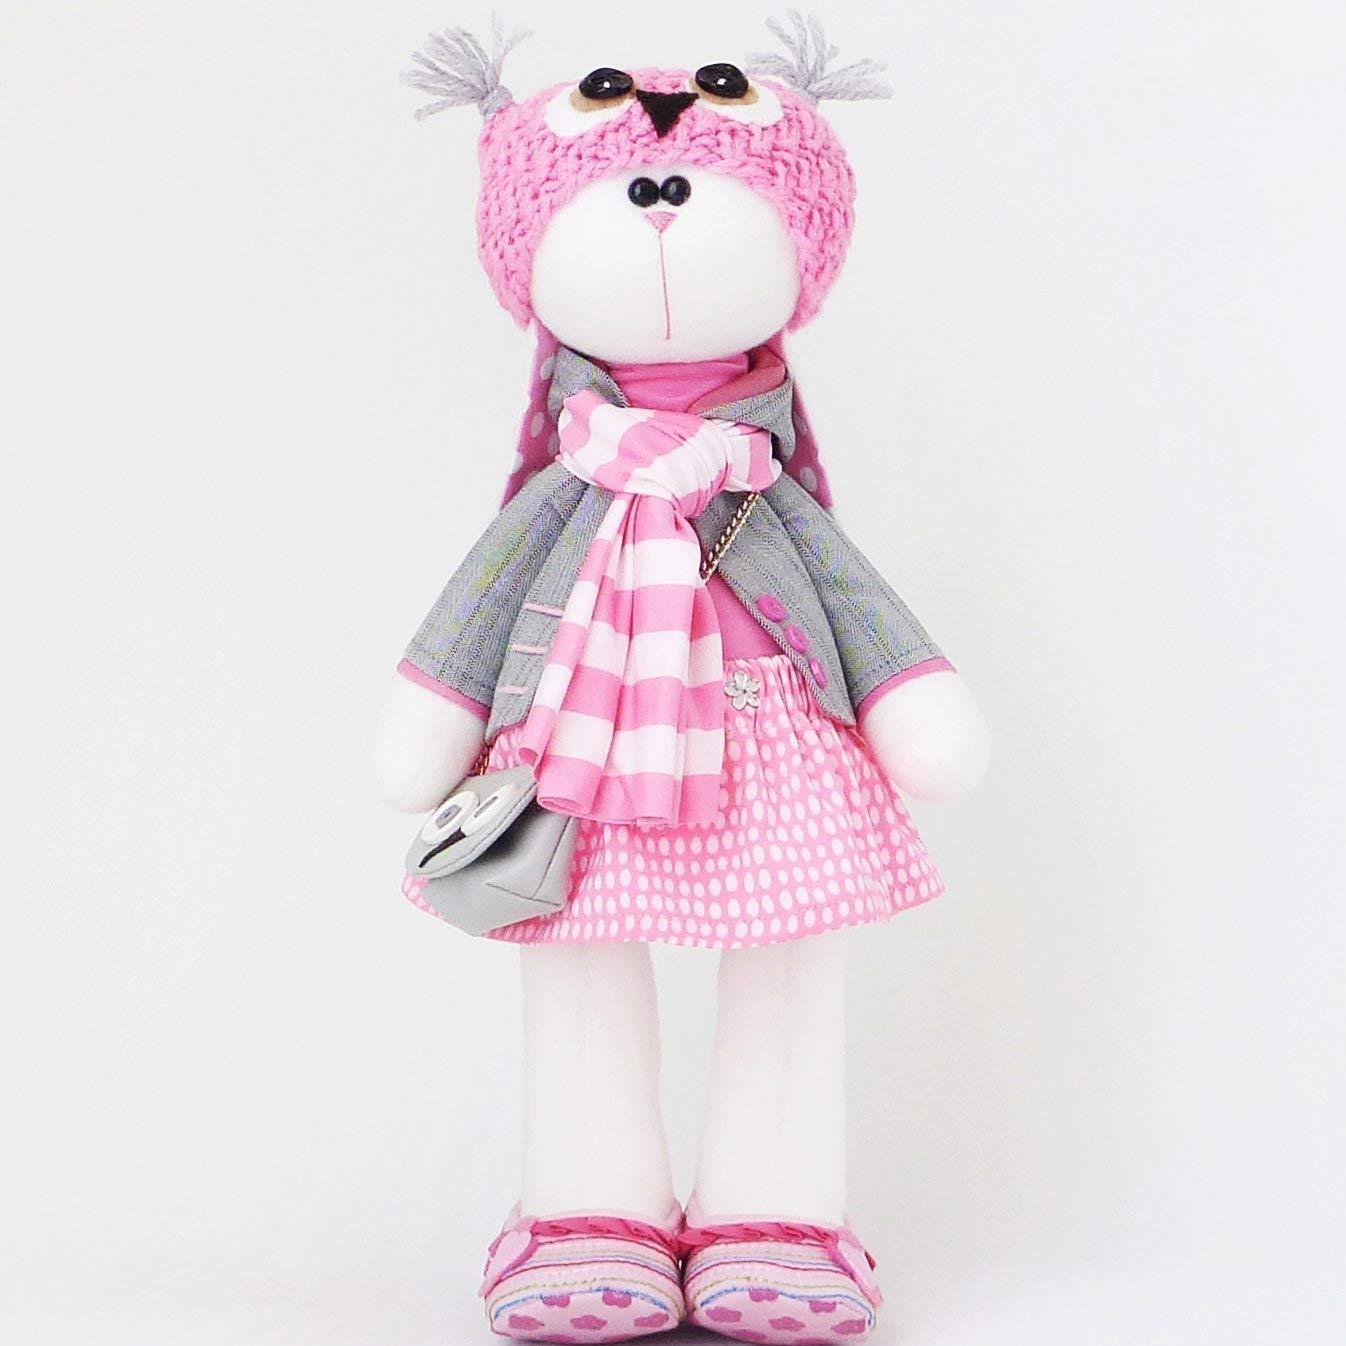 Easter bunny toy 14.5 inch handmade dolls by ZuzuHappyToys